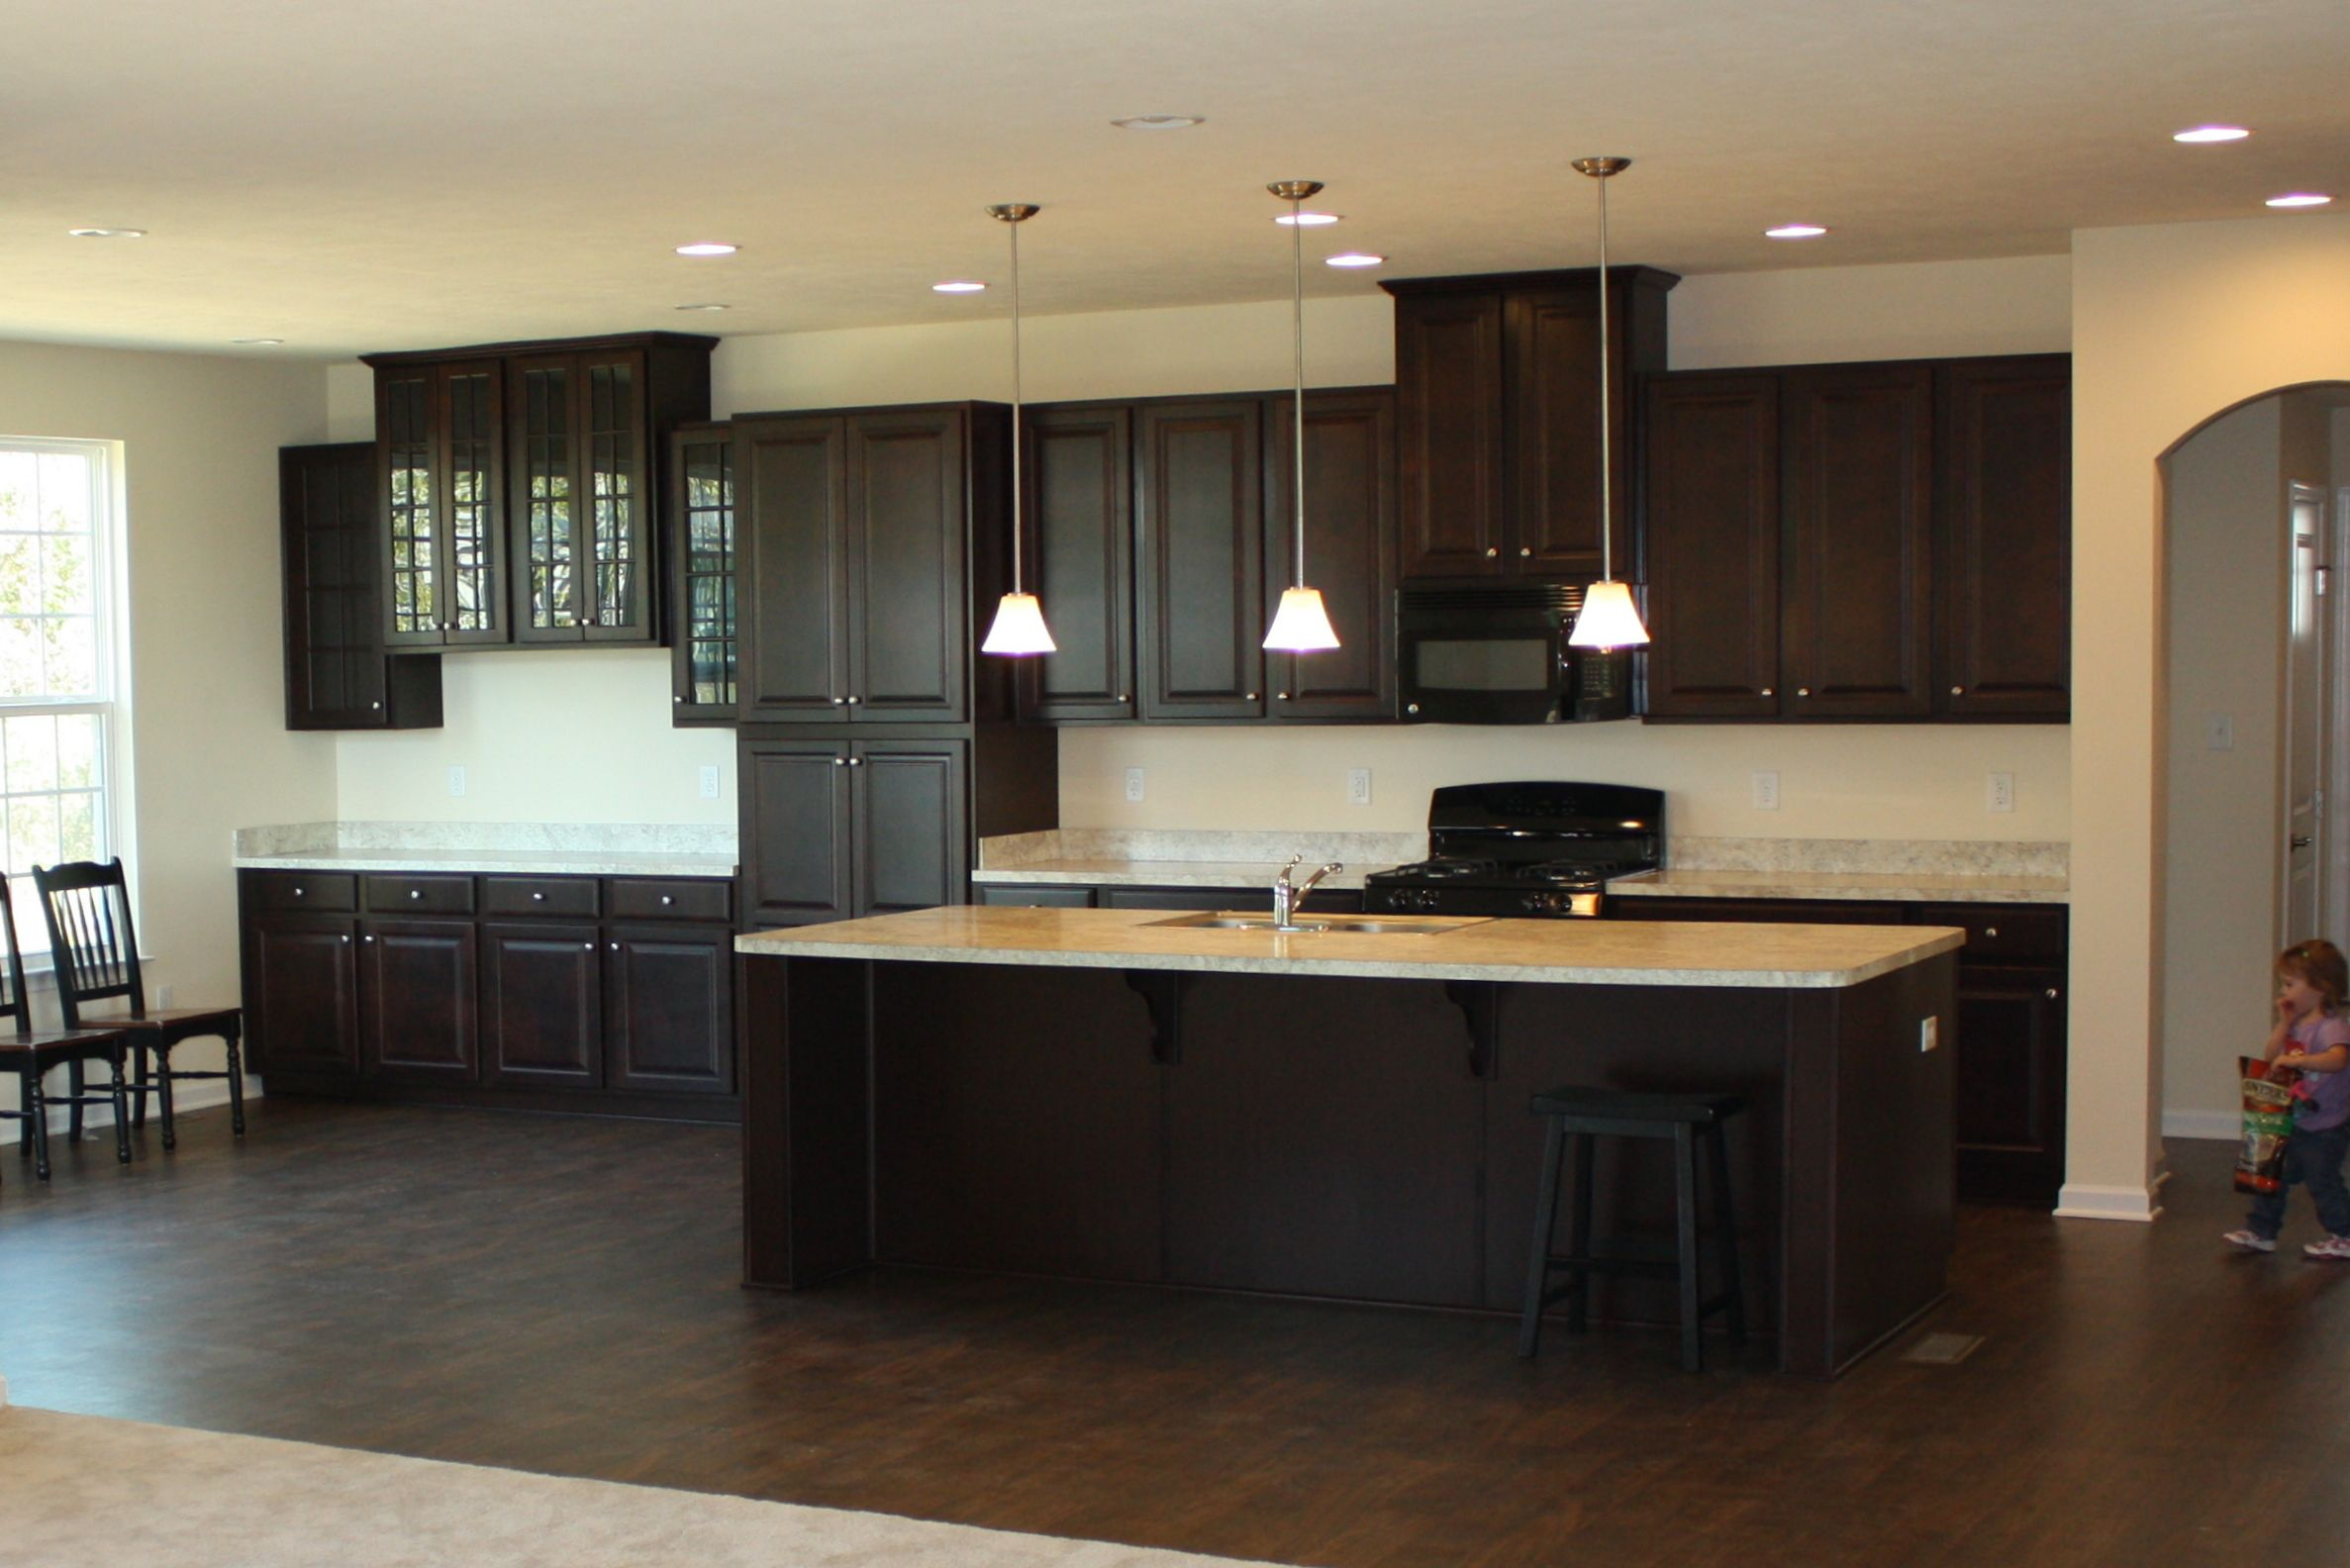 Kitchen Wyoming Cherry Java Cabinets Kitchen Interior Home Renovation Kitchen Layout